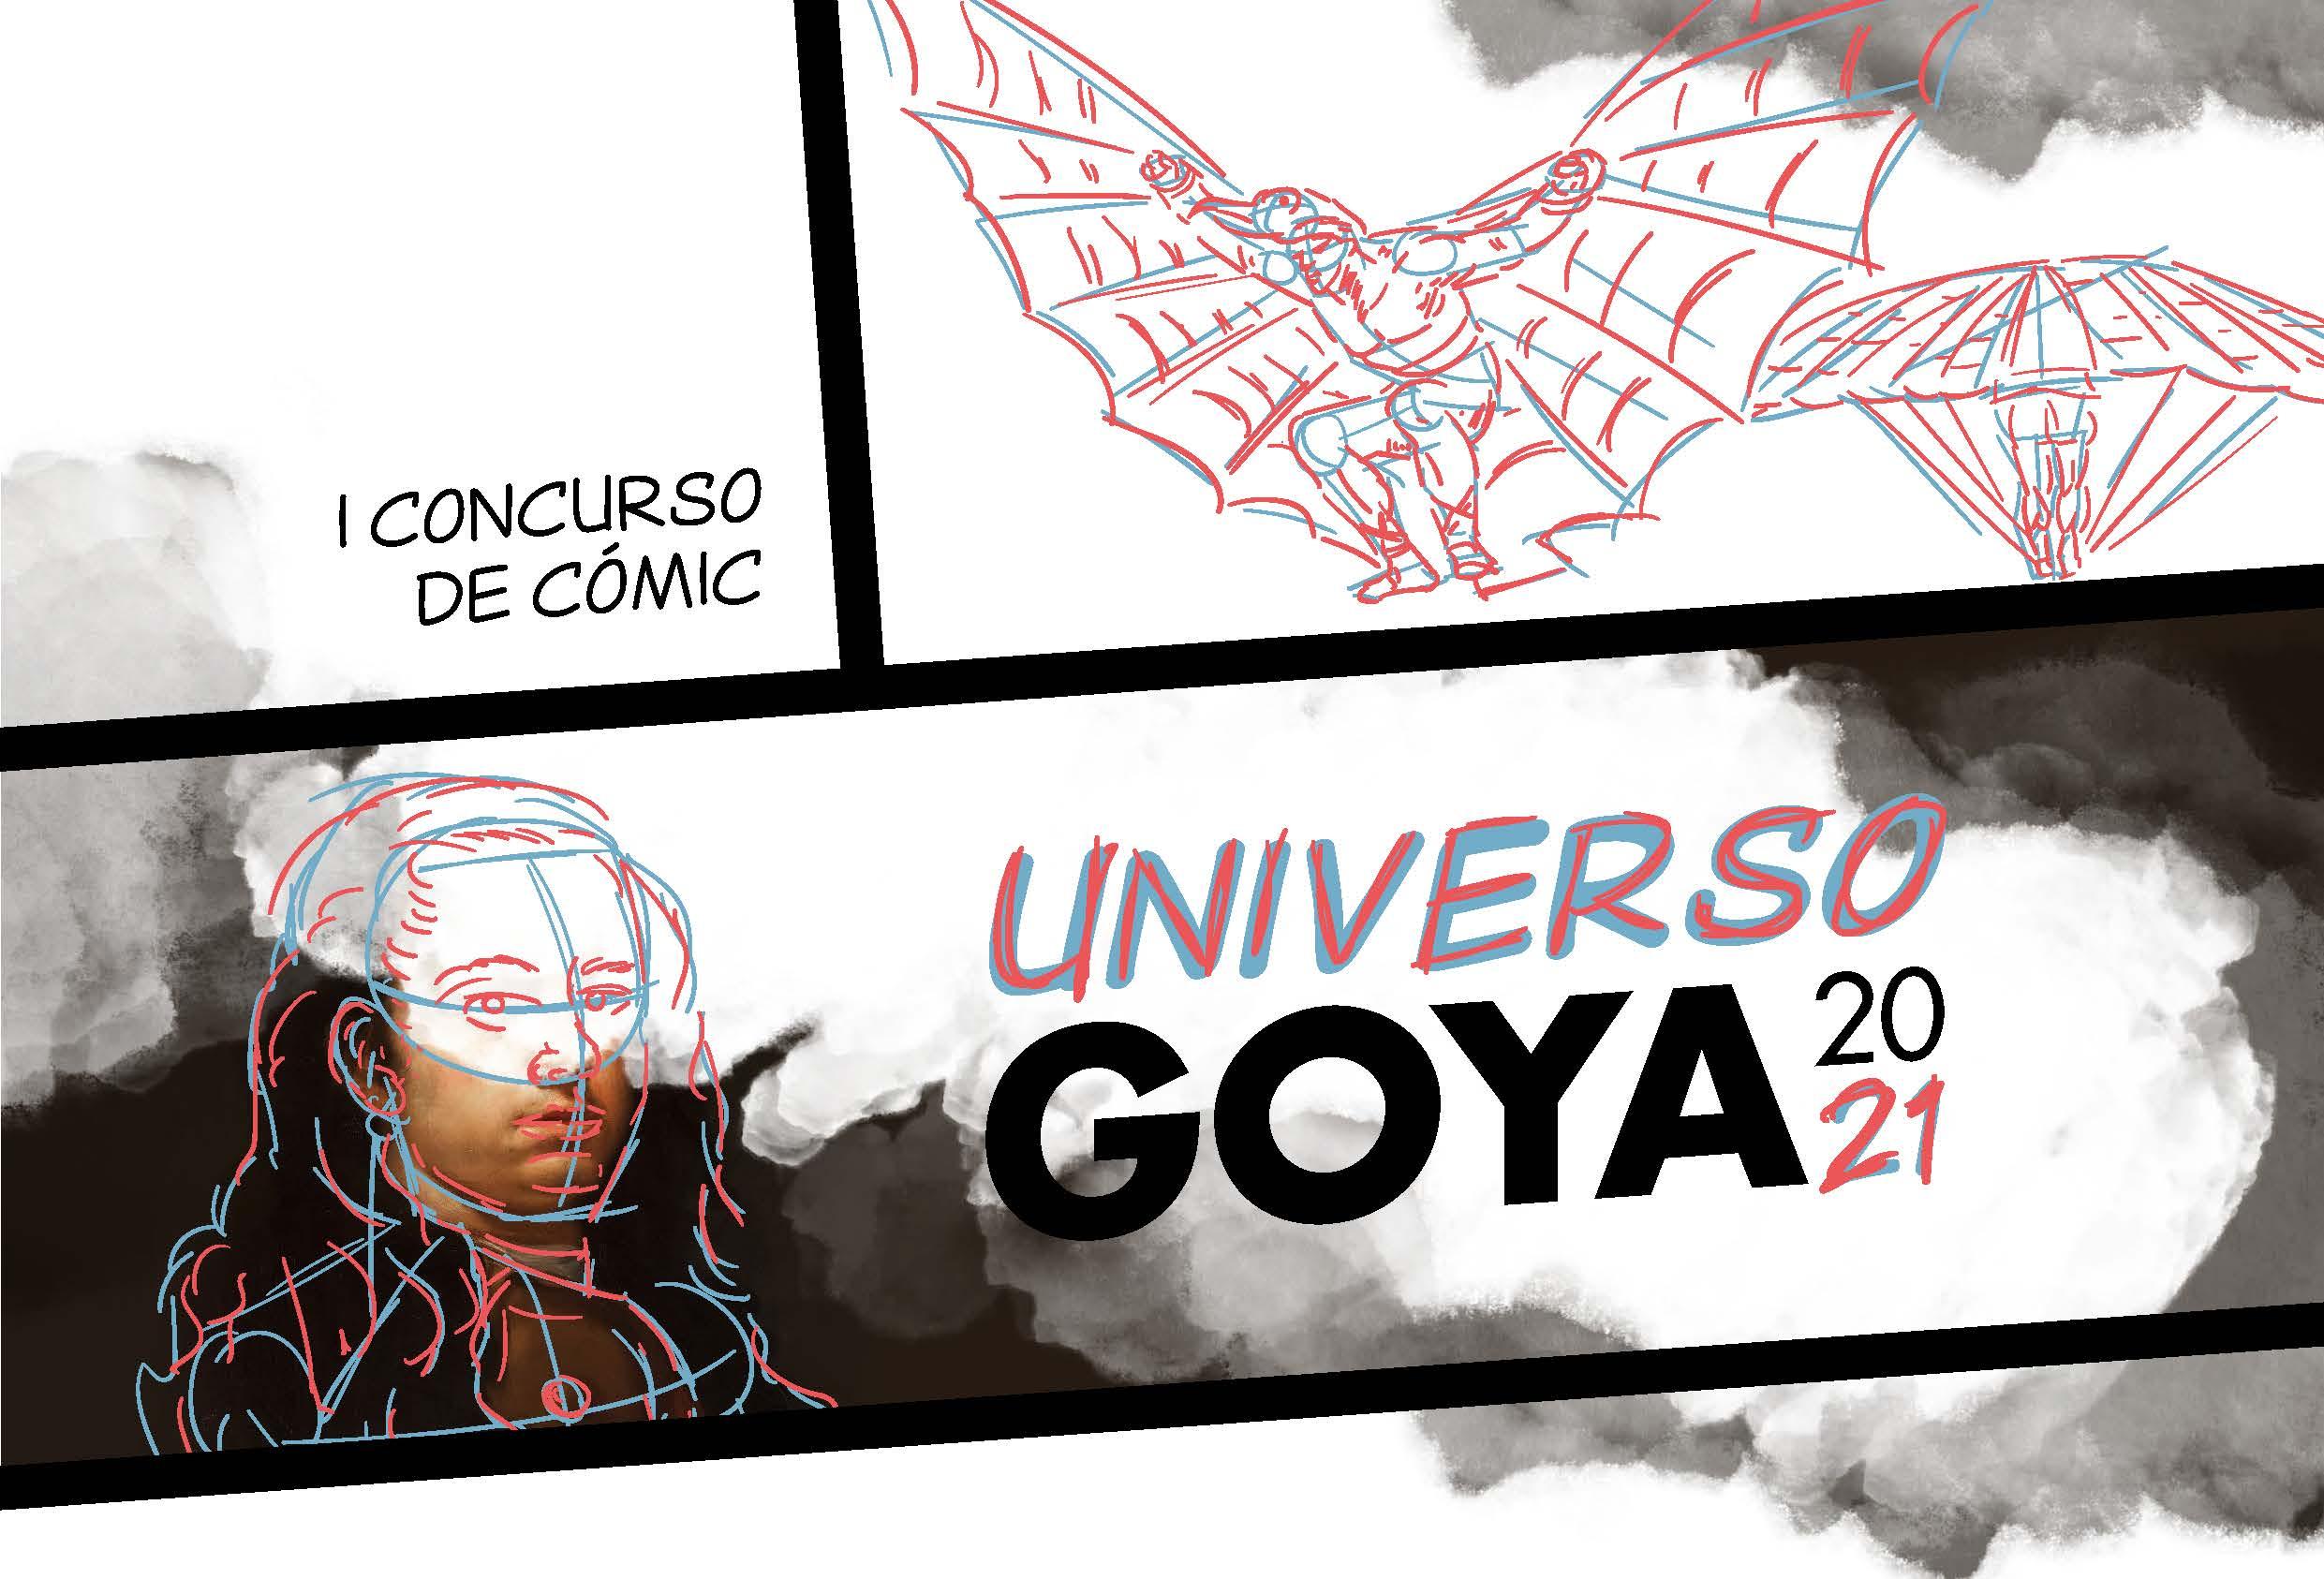 I Concurso de Cómic_Universo Goya2